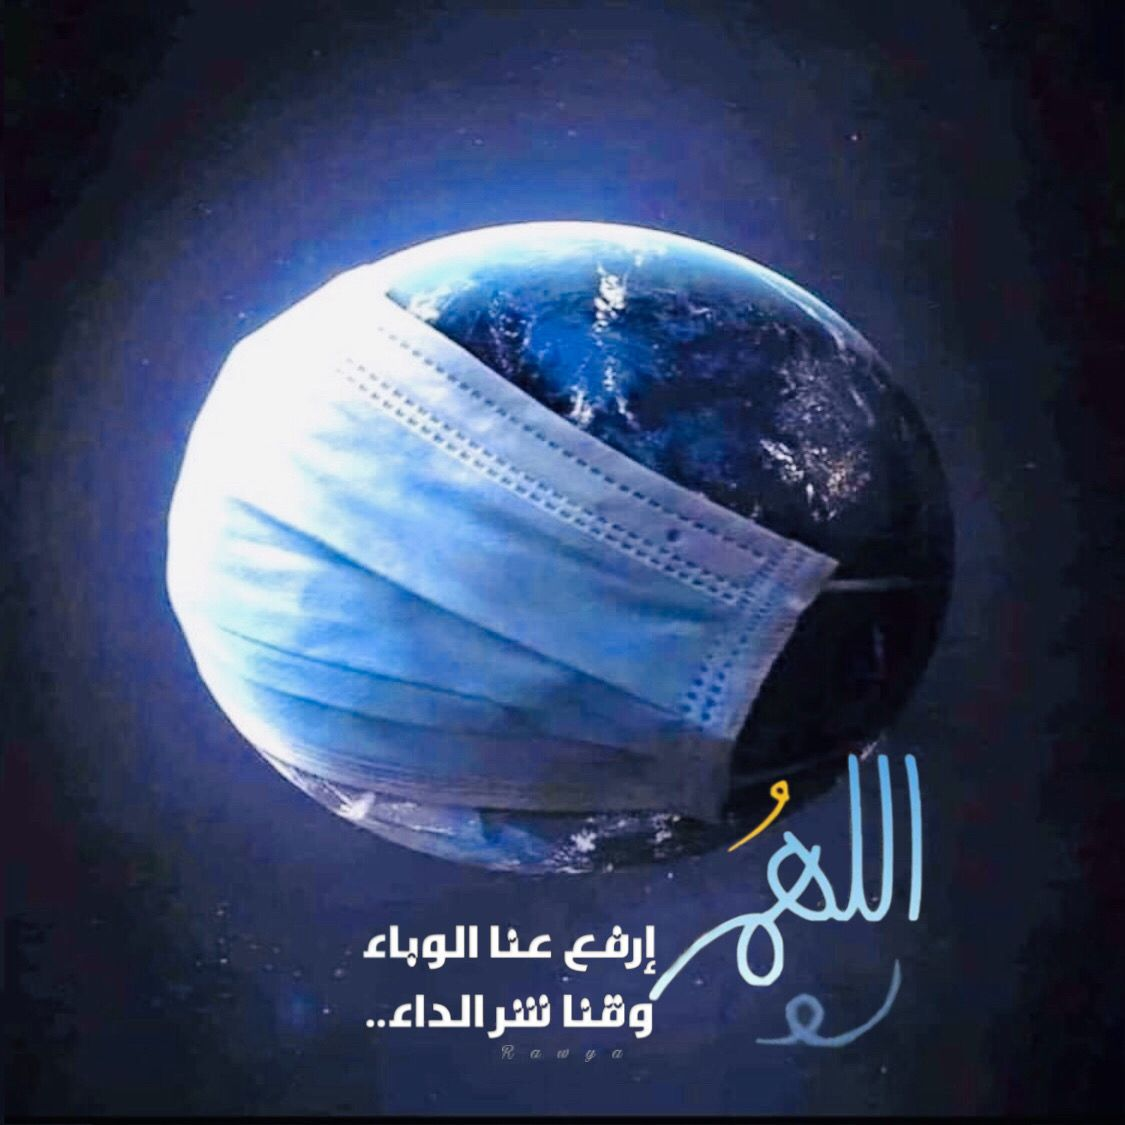 Pin By Zuhura Salum On Dua Islamic Pictures Islam 10 Things